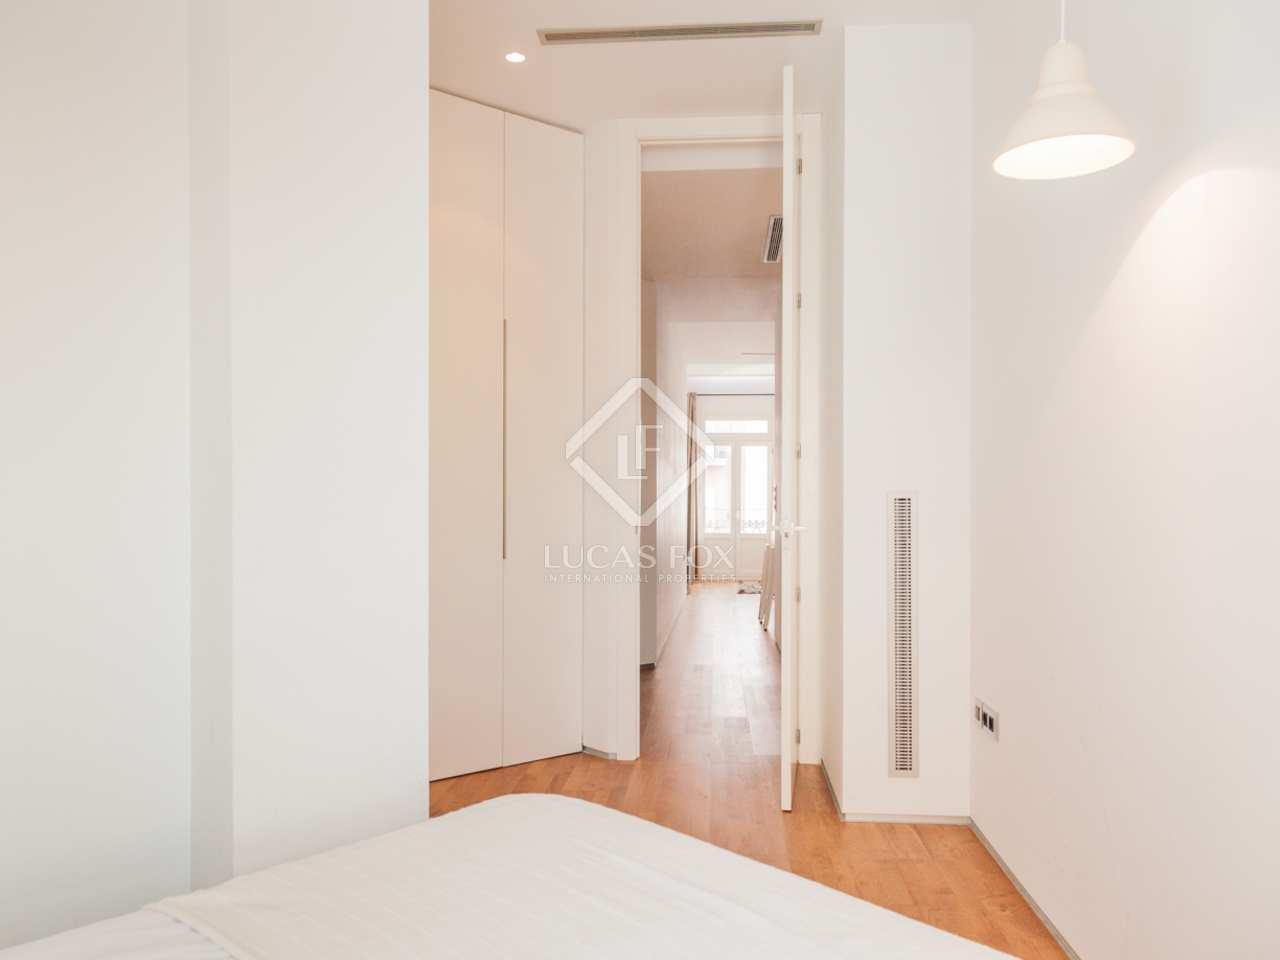 Appartement de 78m a vendre ruzafa valence - Appartement de ville anton bazaliiskii ...